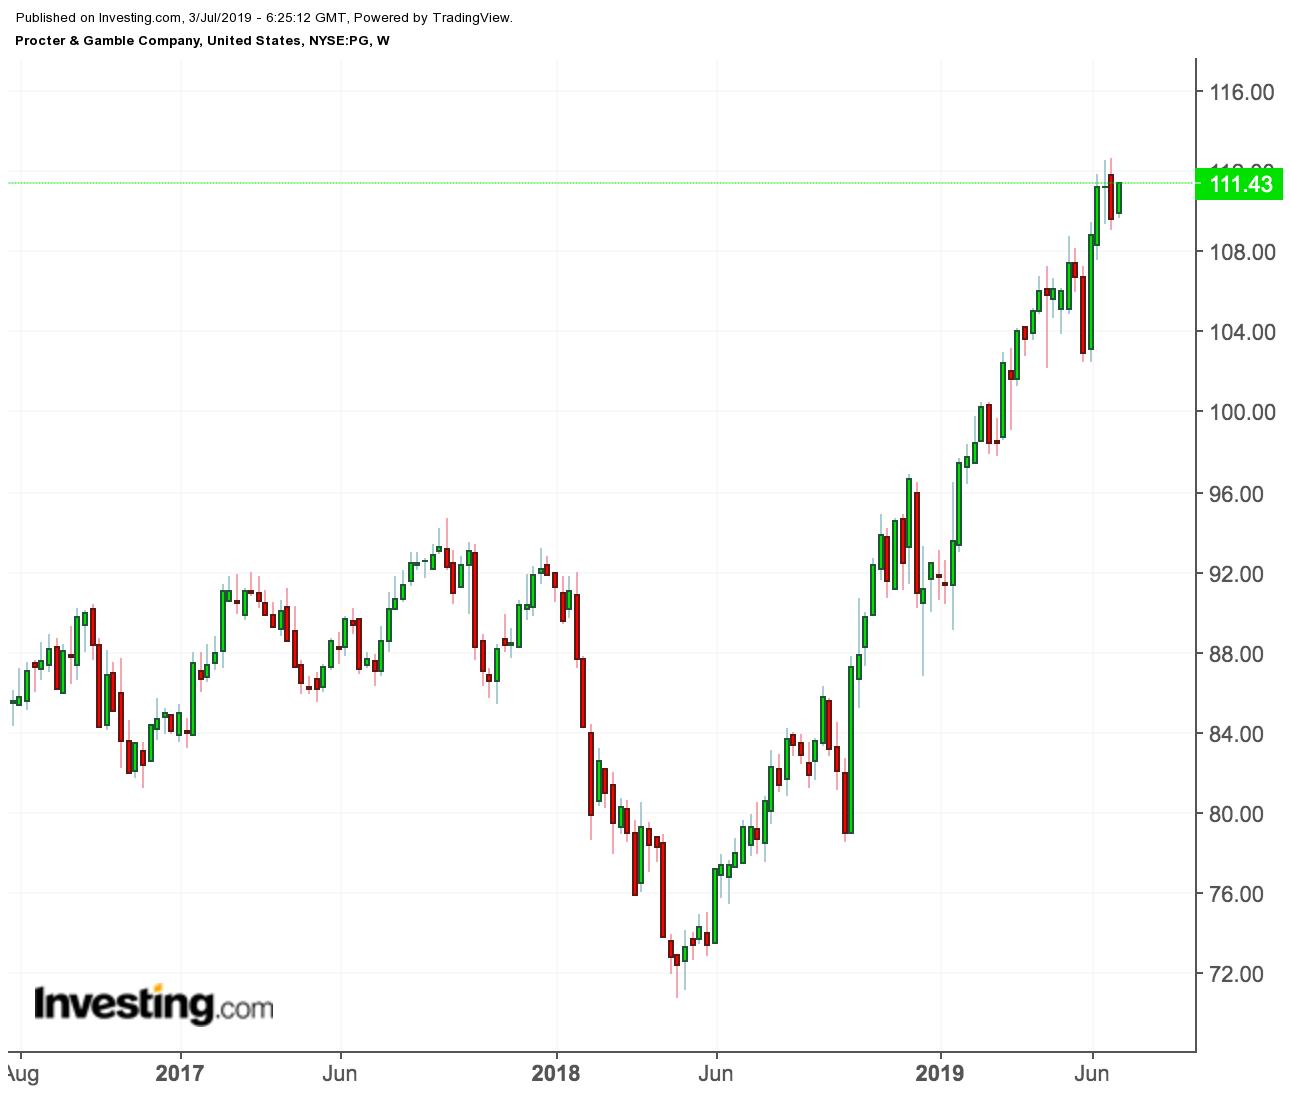 Aktien P&G